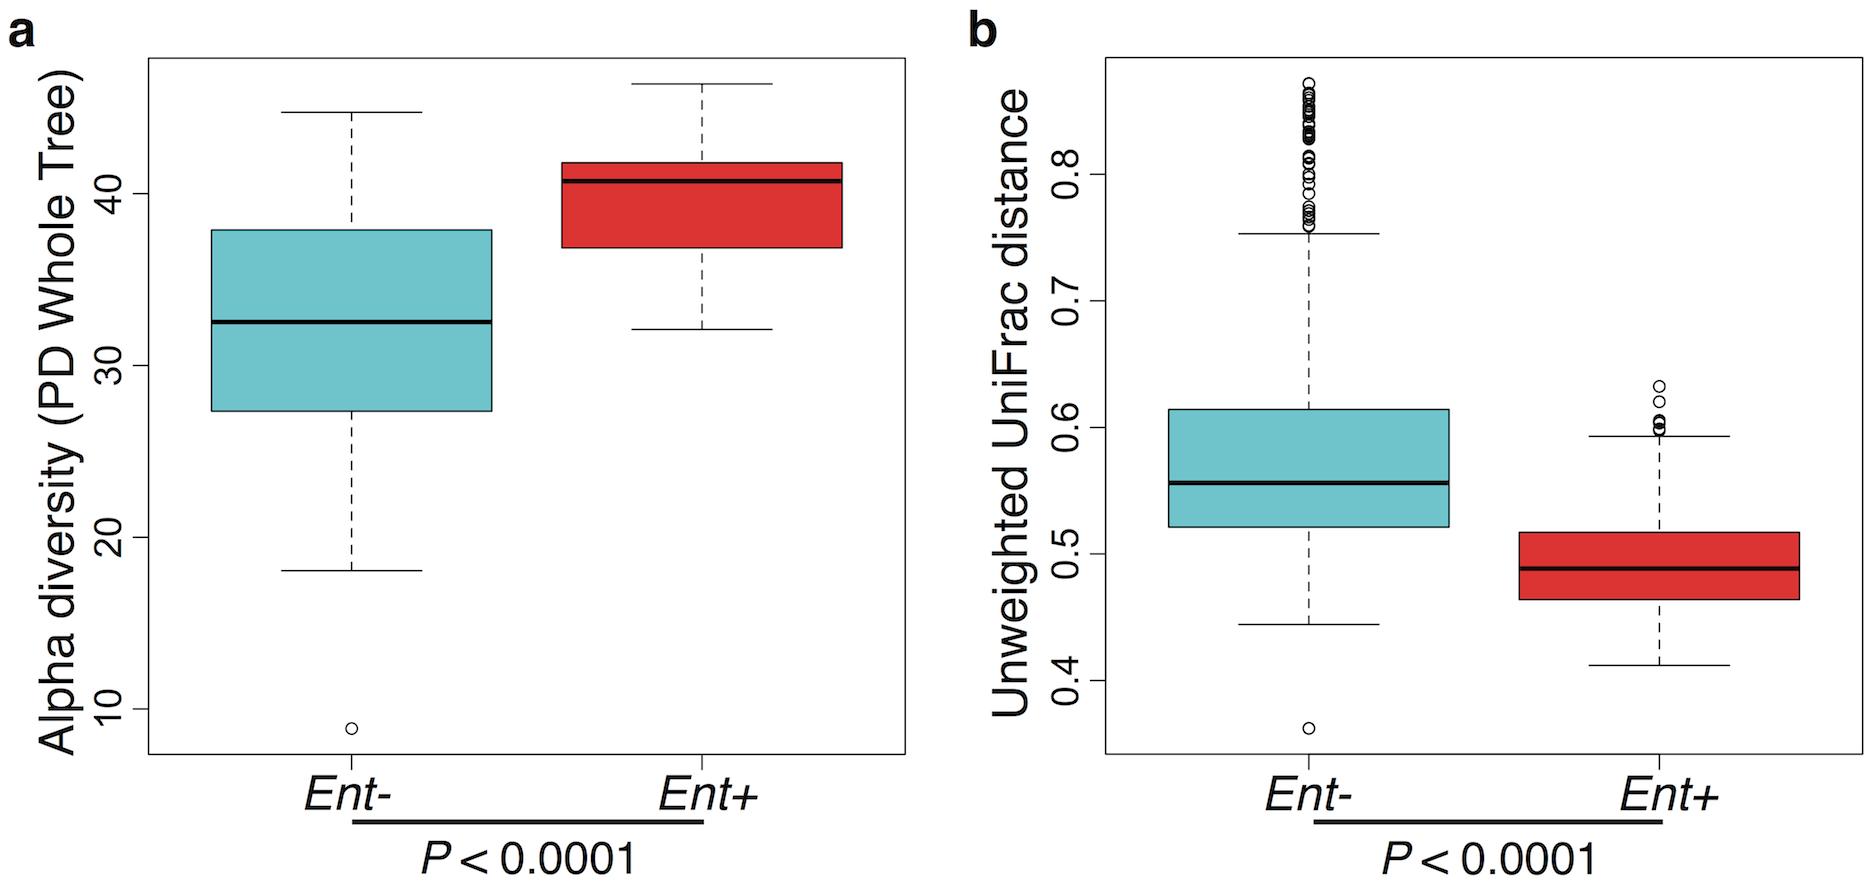 (a) Comparison of alpha diversity for <i>Entamoeba</i> negative (<i>Ent</i>-) and positive (<i>Ent</i>+) individuals using the phylogenetic distance whole tree metric.